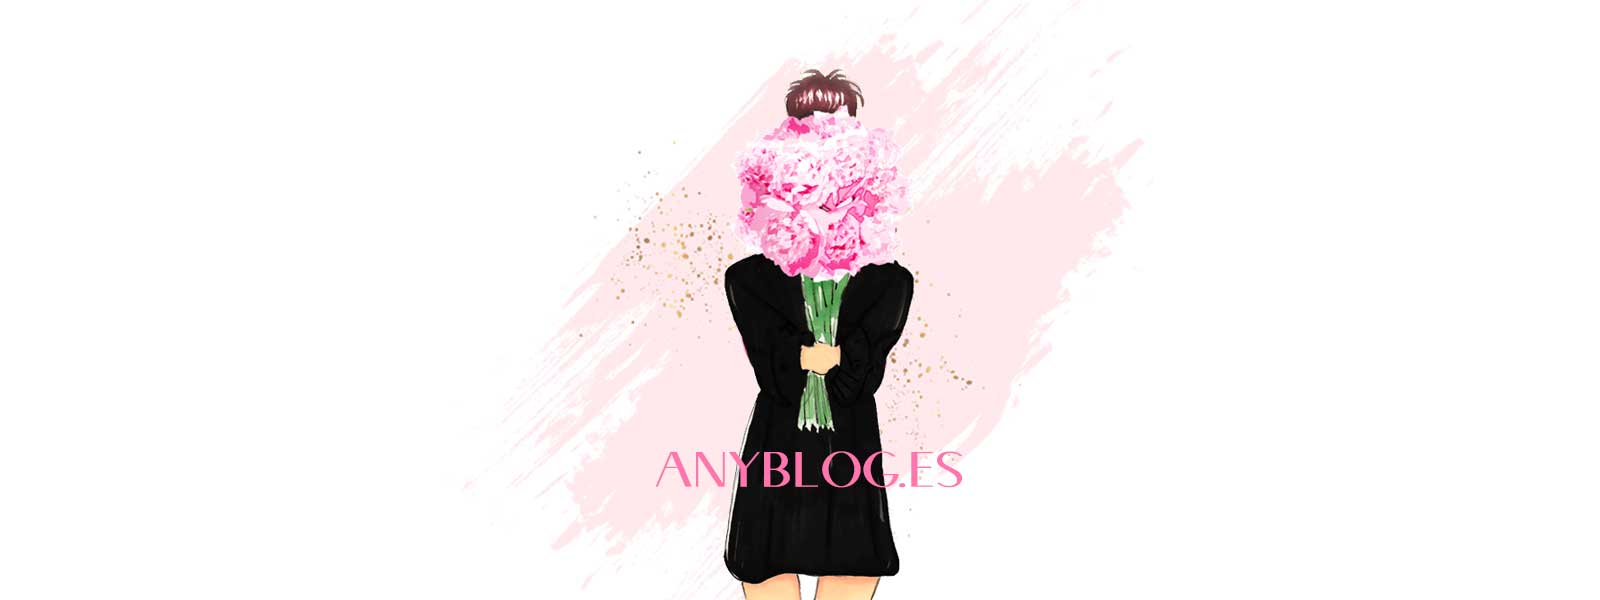 Anyblog